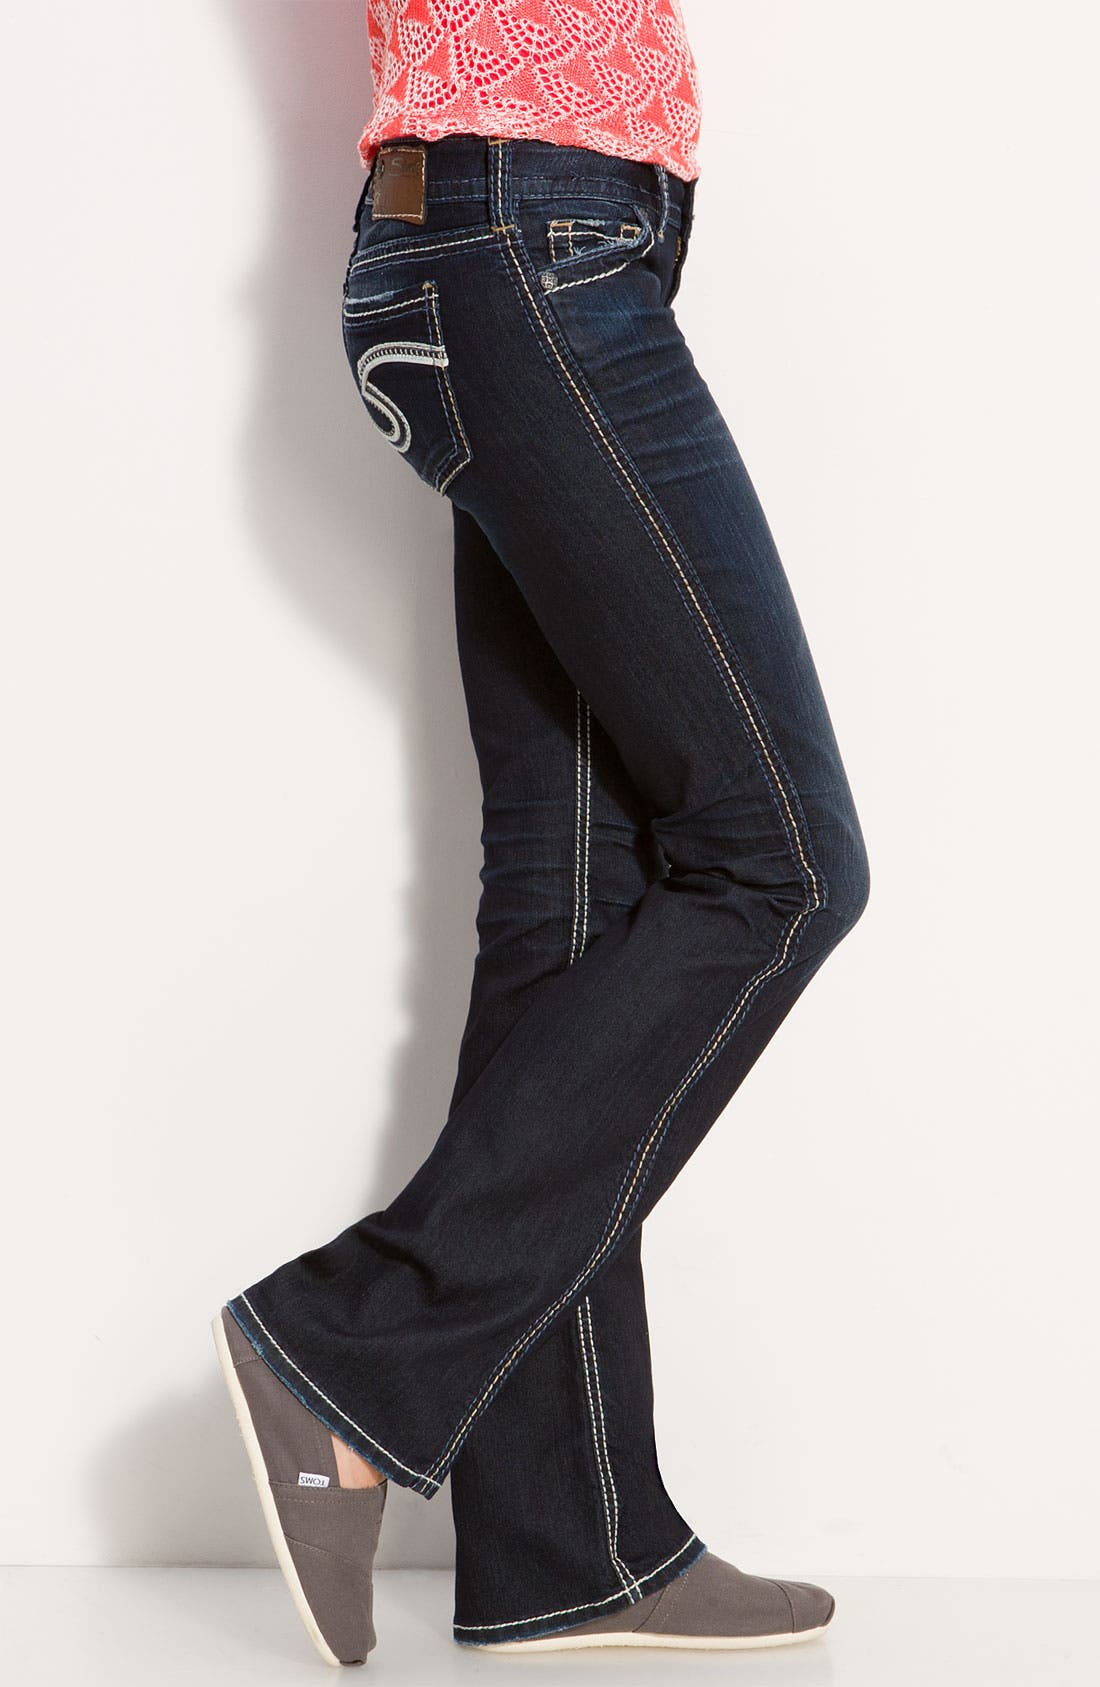 Alternate Image 3  - Silver Jeans Co. 'Frances' Bootcut Jeans (Indigo Wash) (Juniors Regular & Long)